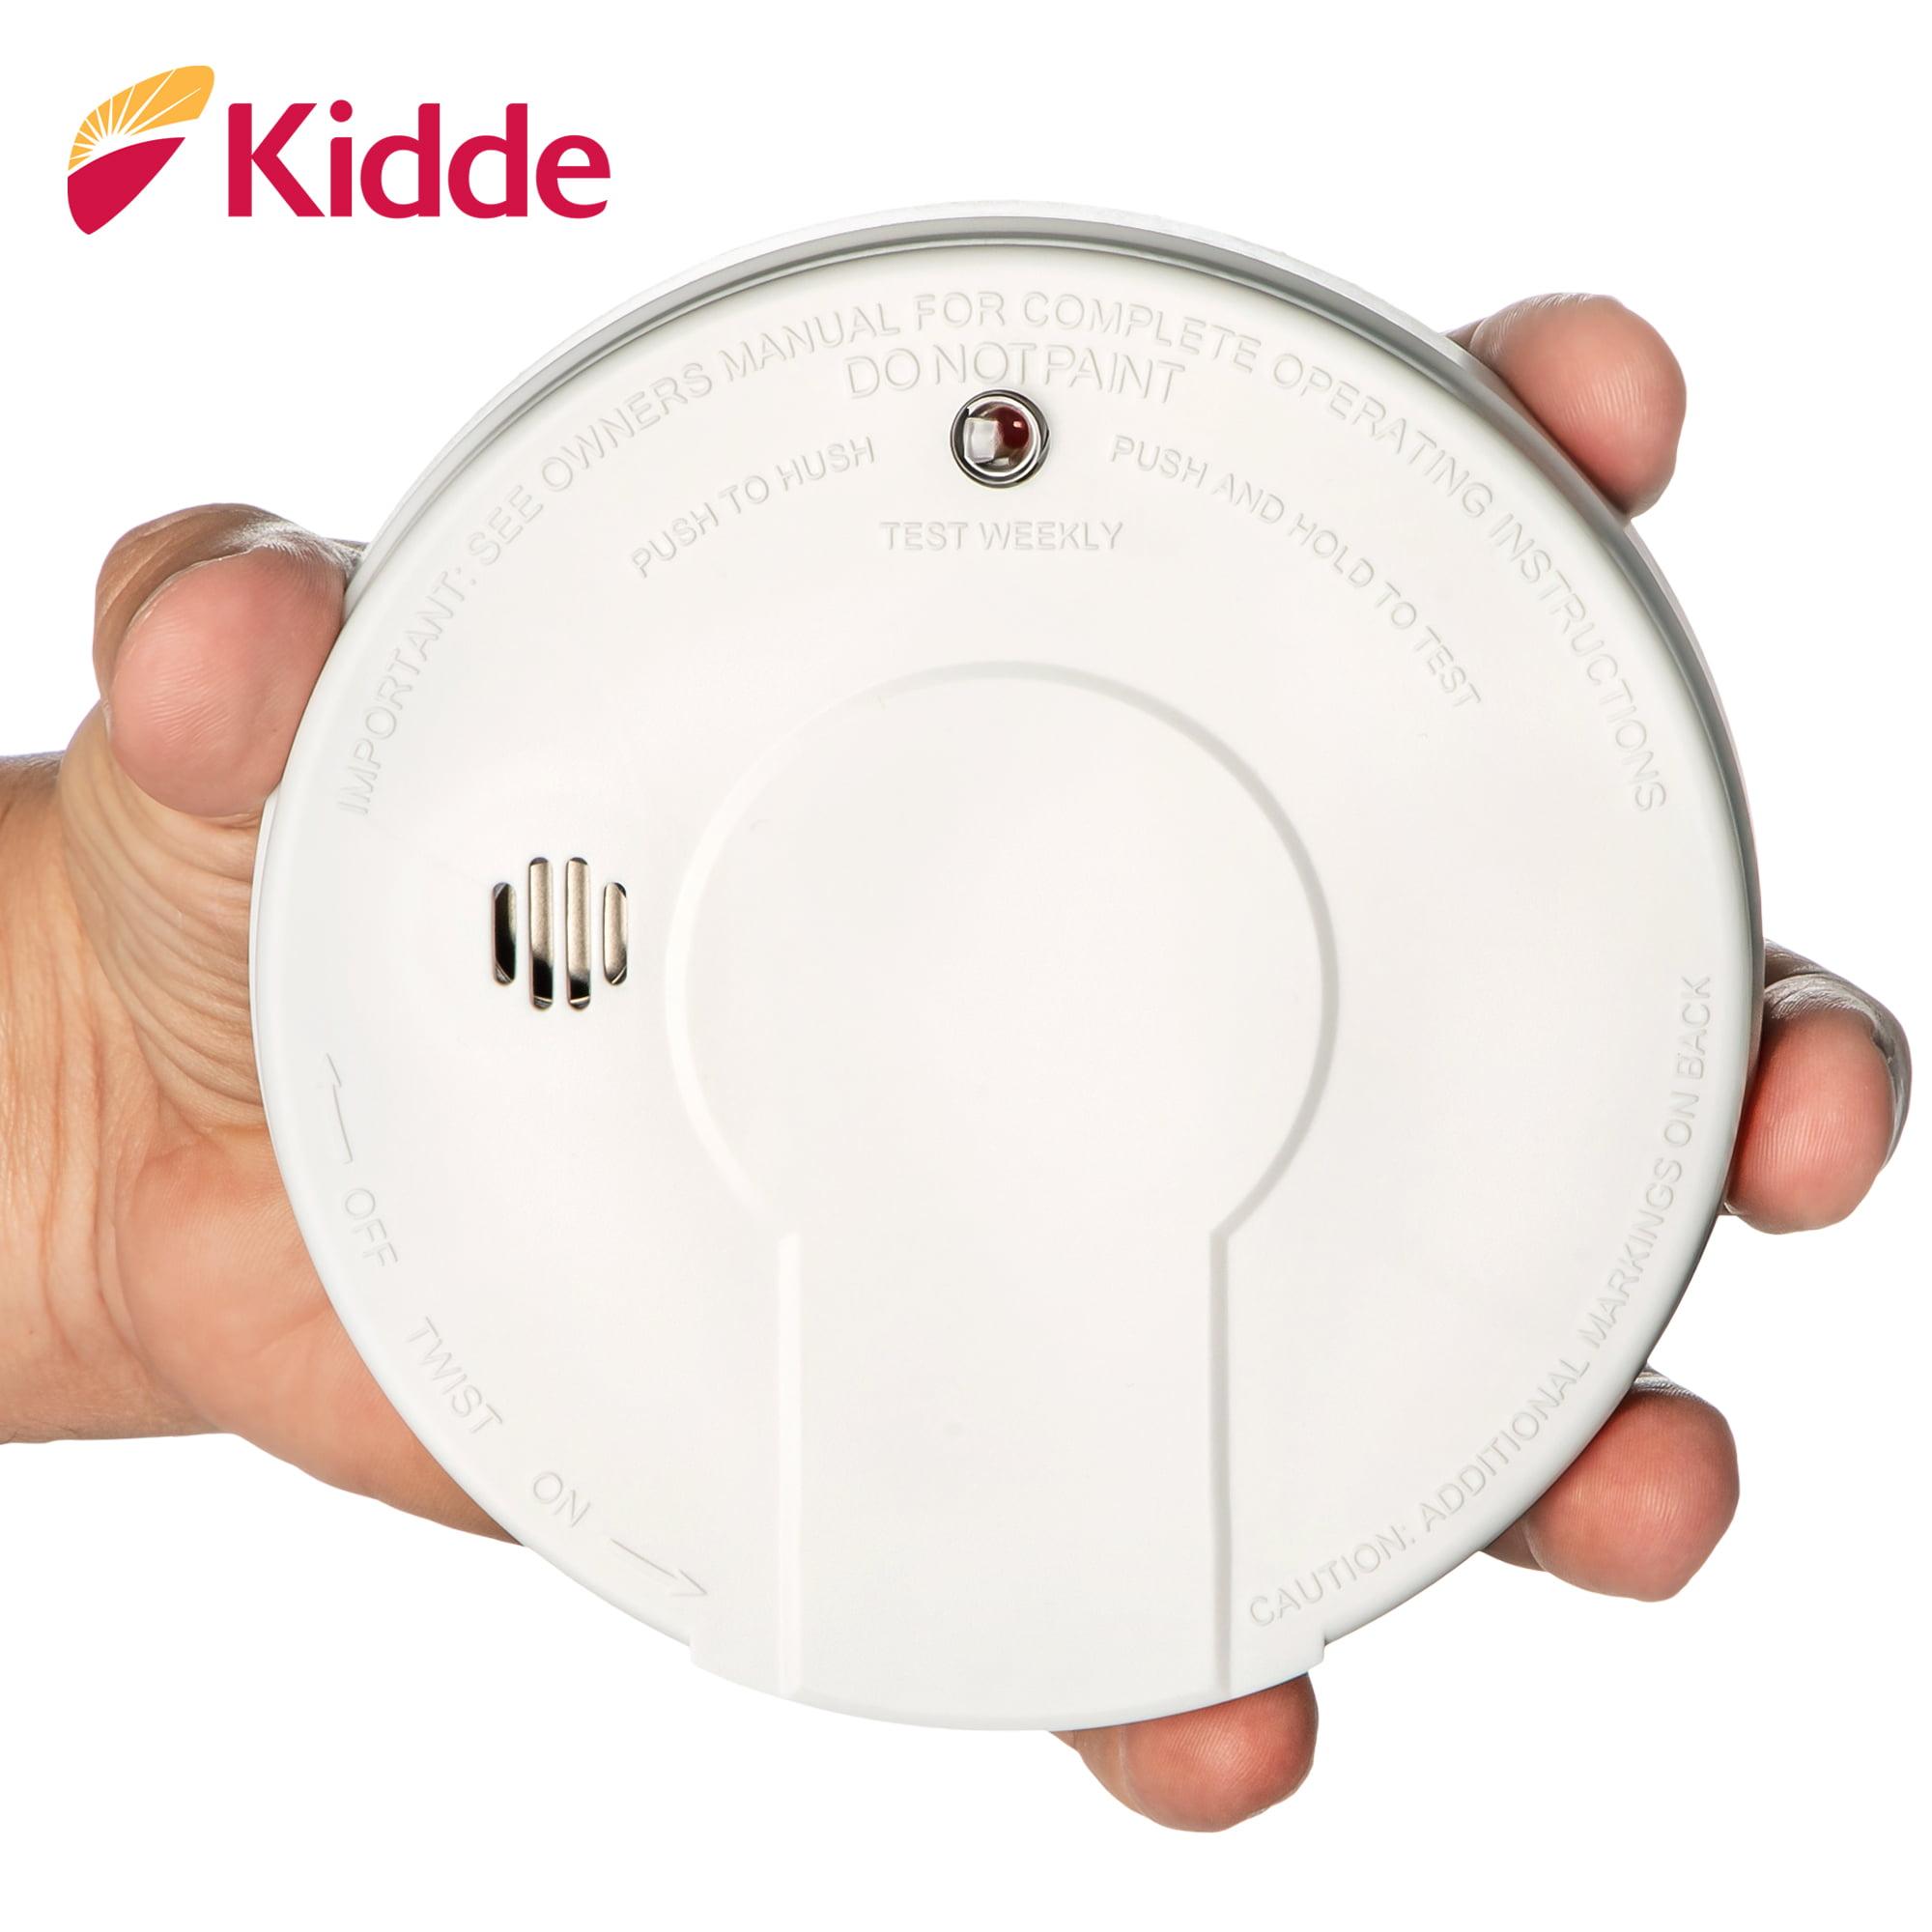 Kidde Fyrewatch 0913 9v Battery Operated Smoke Alarm Walmart Com